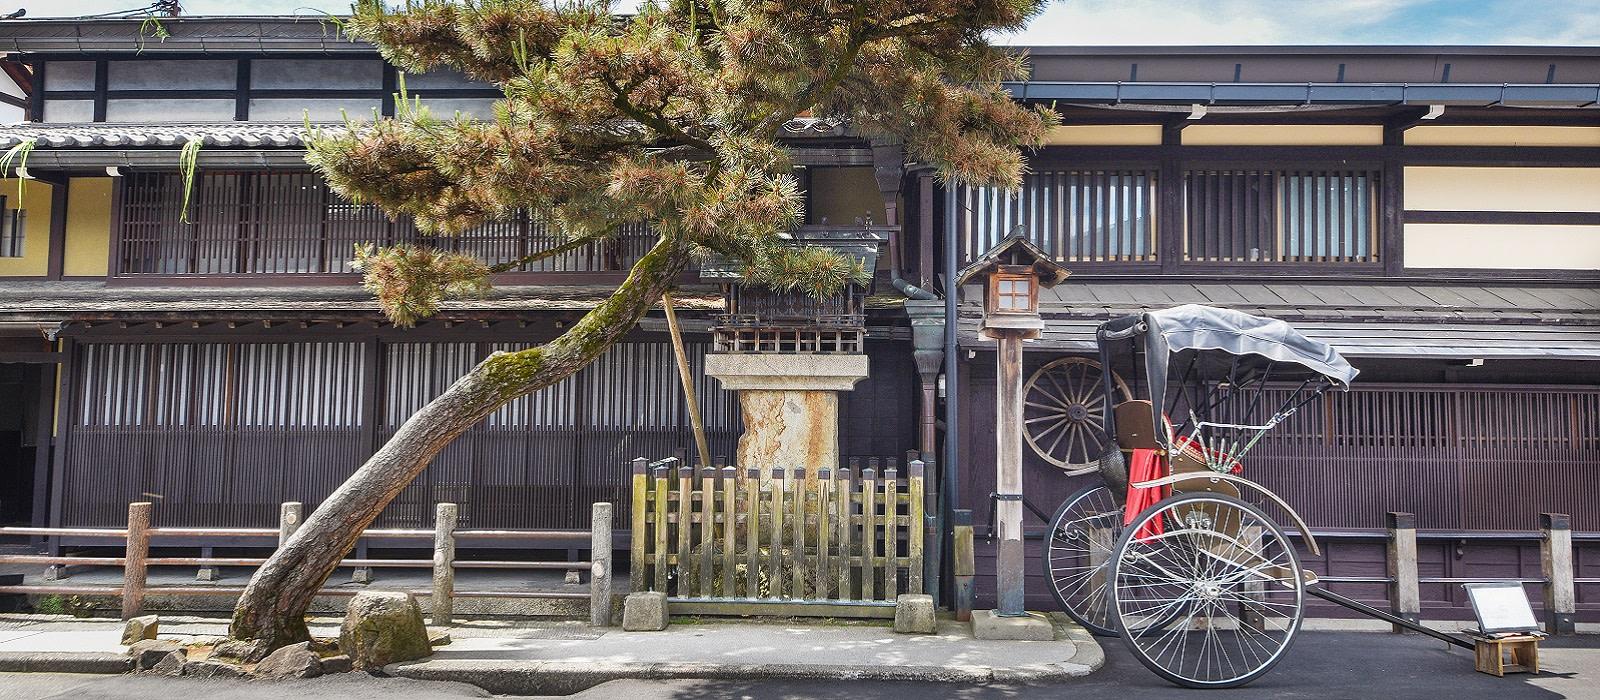 Reiseziel Takayama Japan